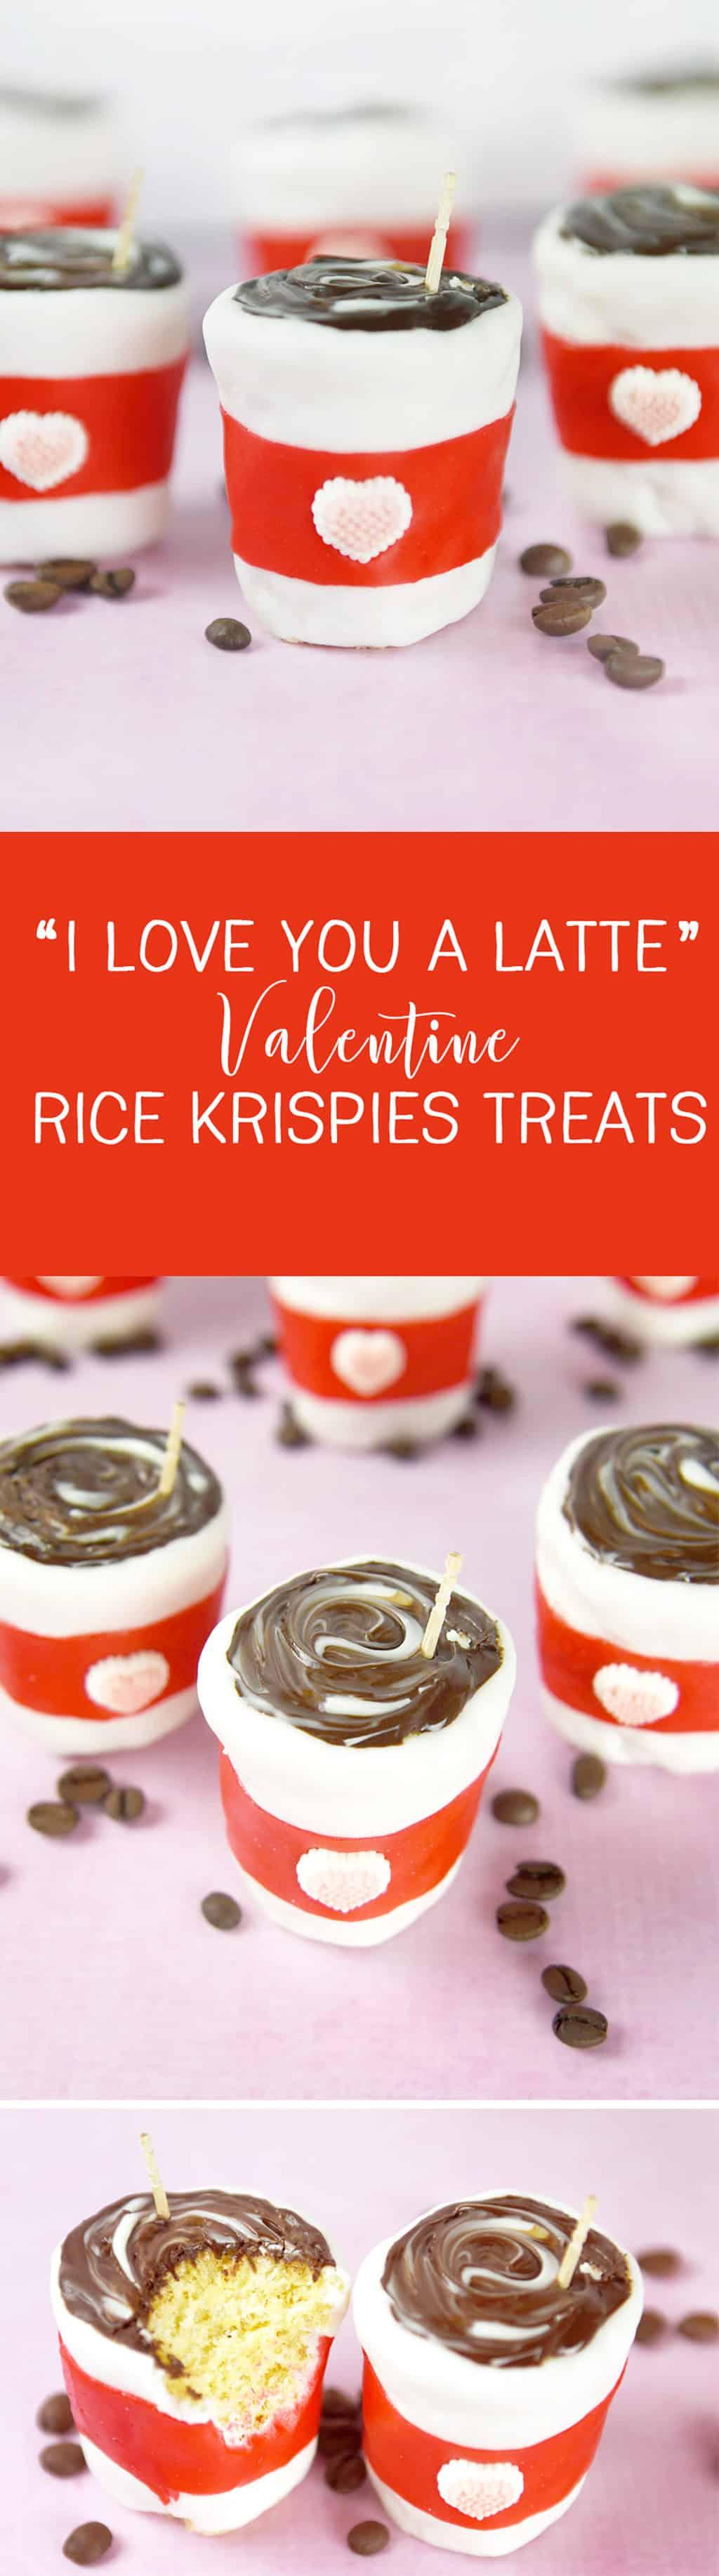 I Love You A Latte Valentine Rice Krispies Treats! Such a cute Valentine treat idea!